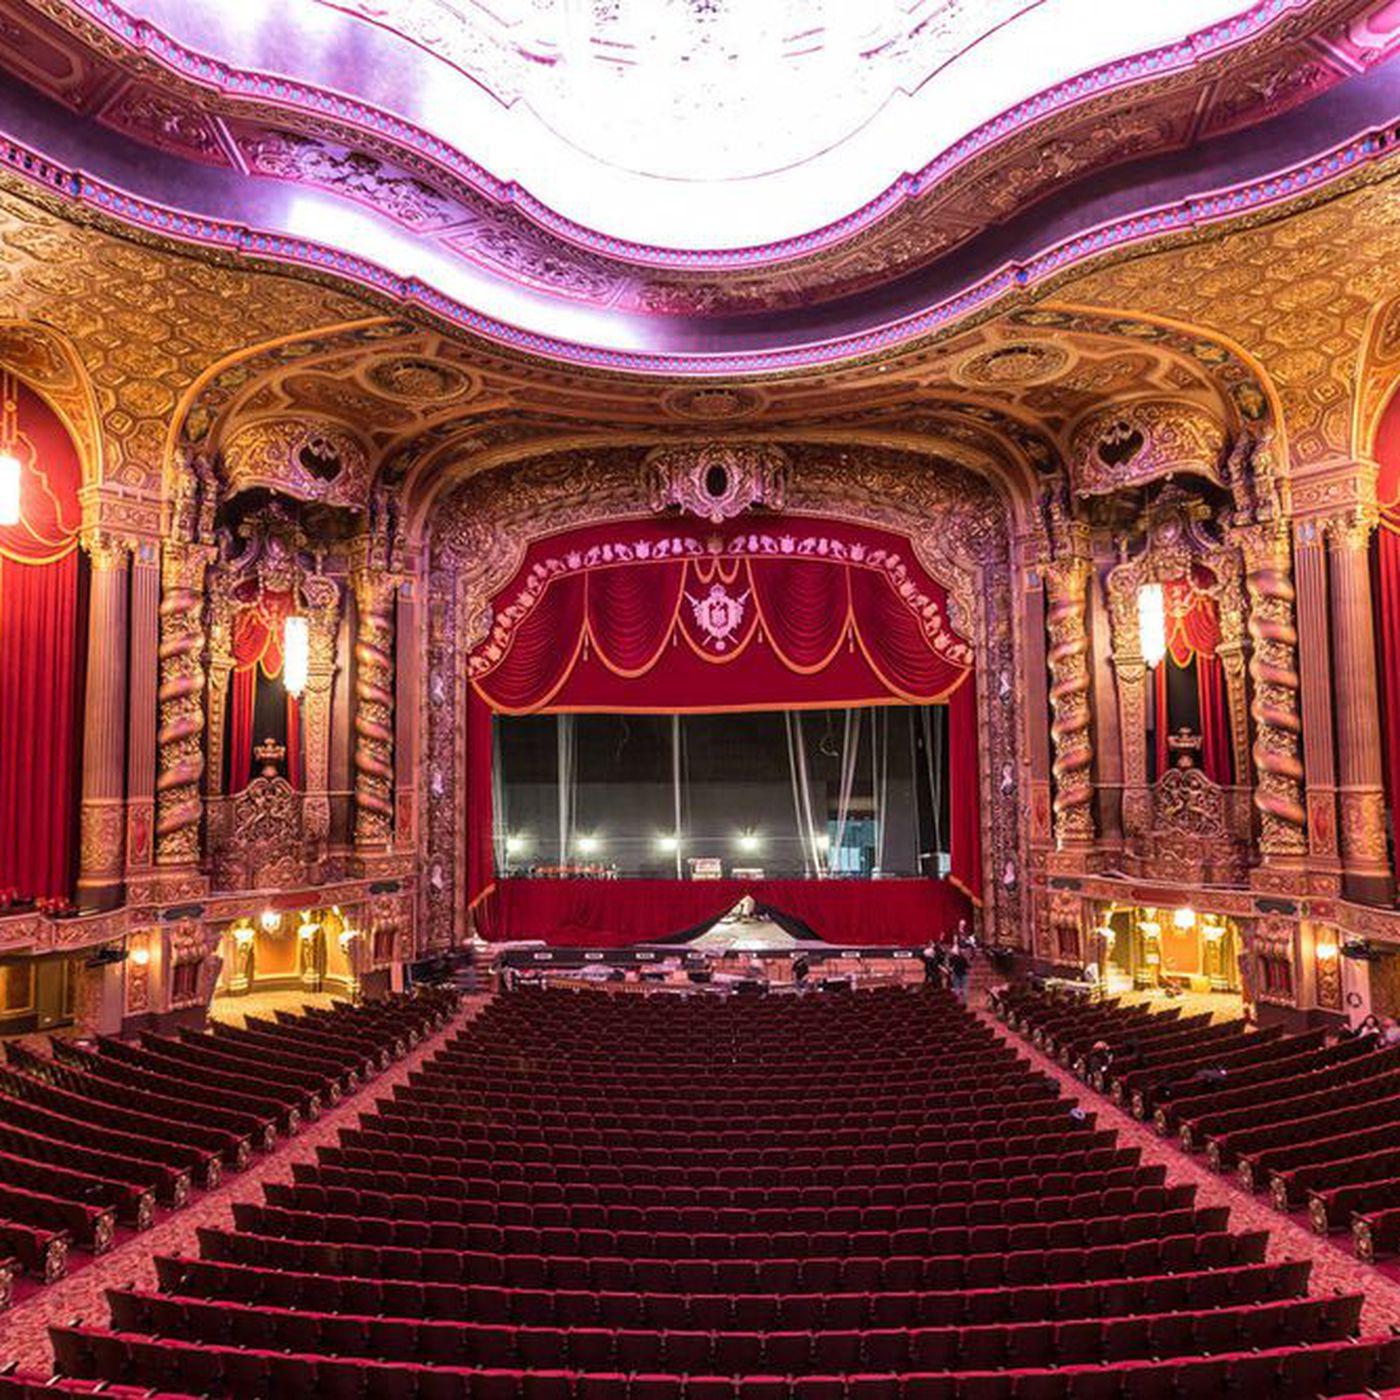 Kings Theatre In Brooklyn Was Recently Lavishly Restored